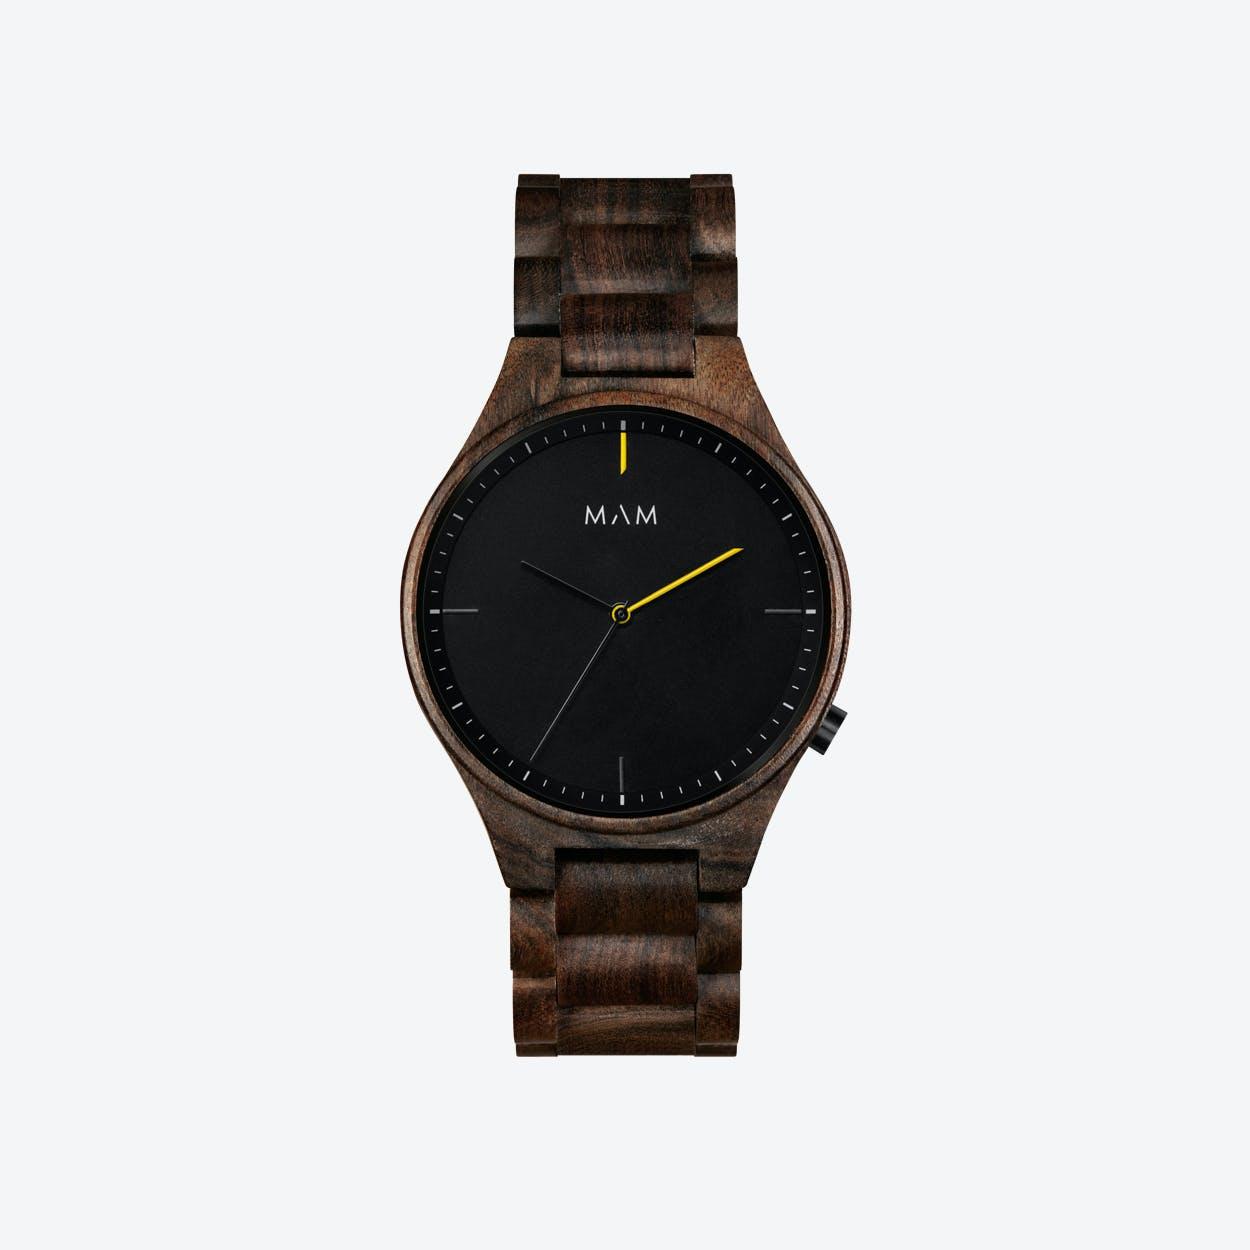 Volcano Wooden Watch in Dark Wood and Black/Yellow  40mm